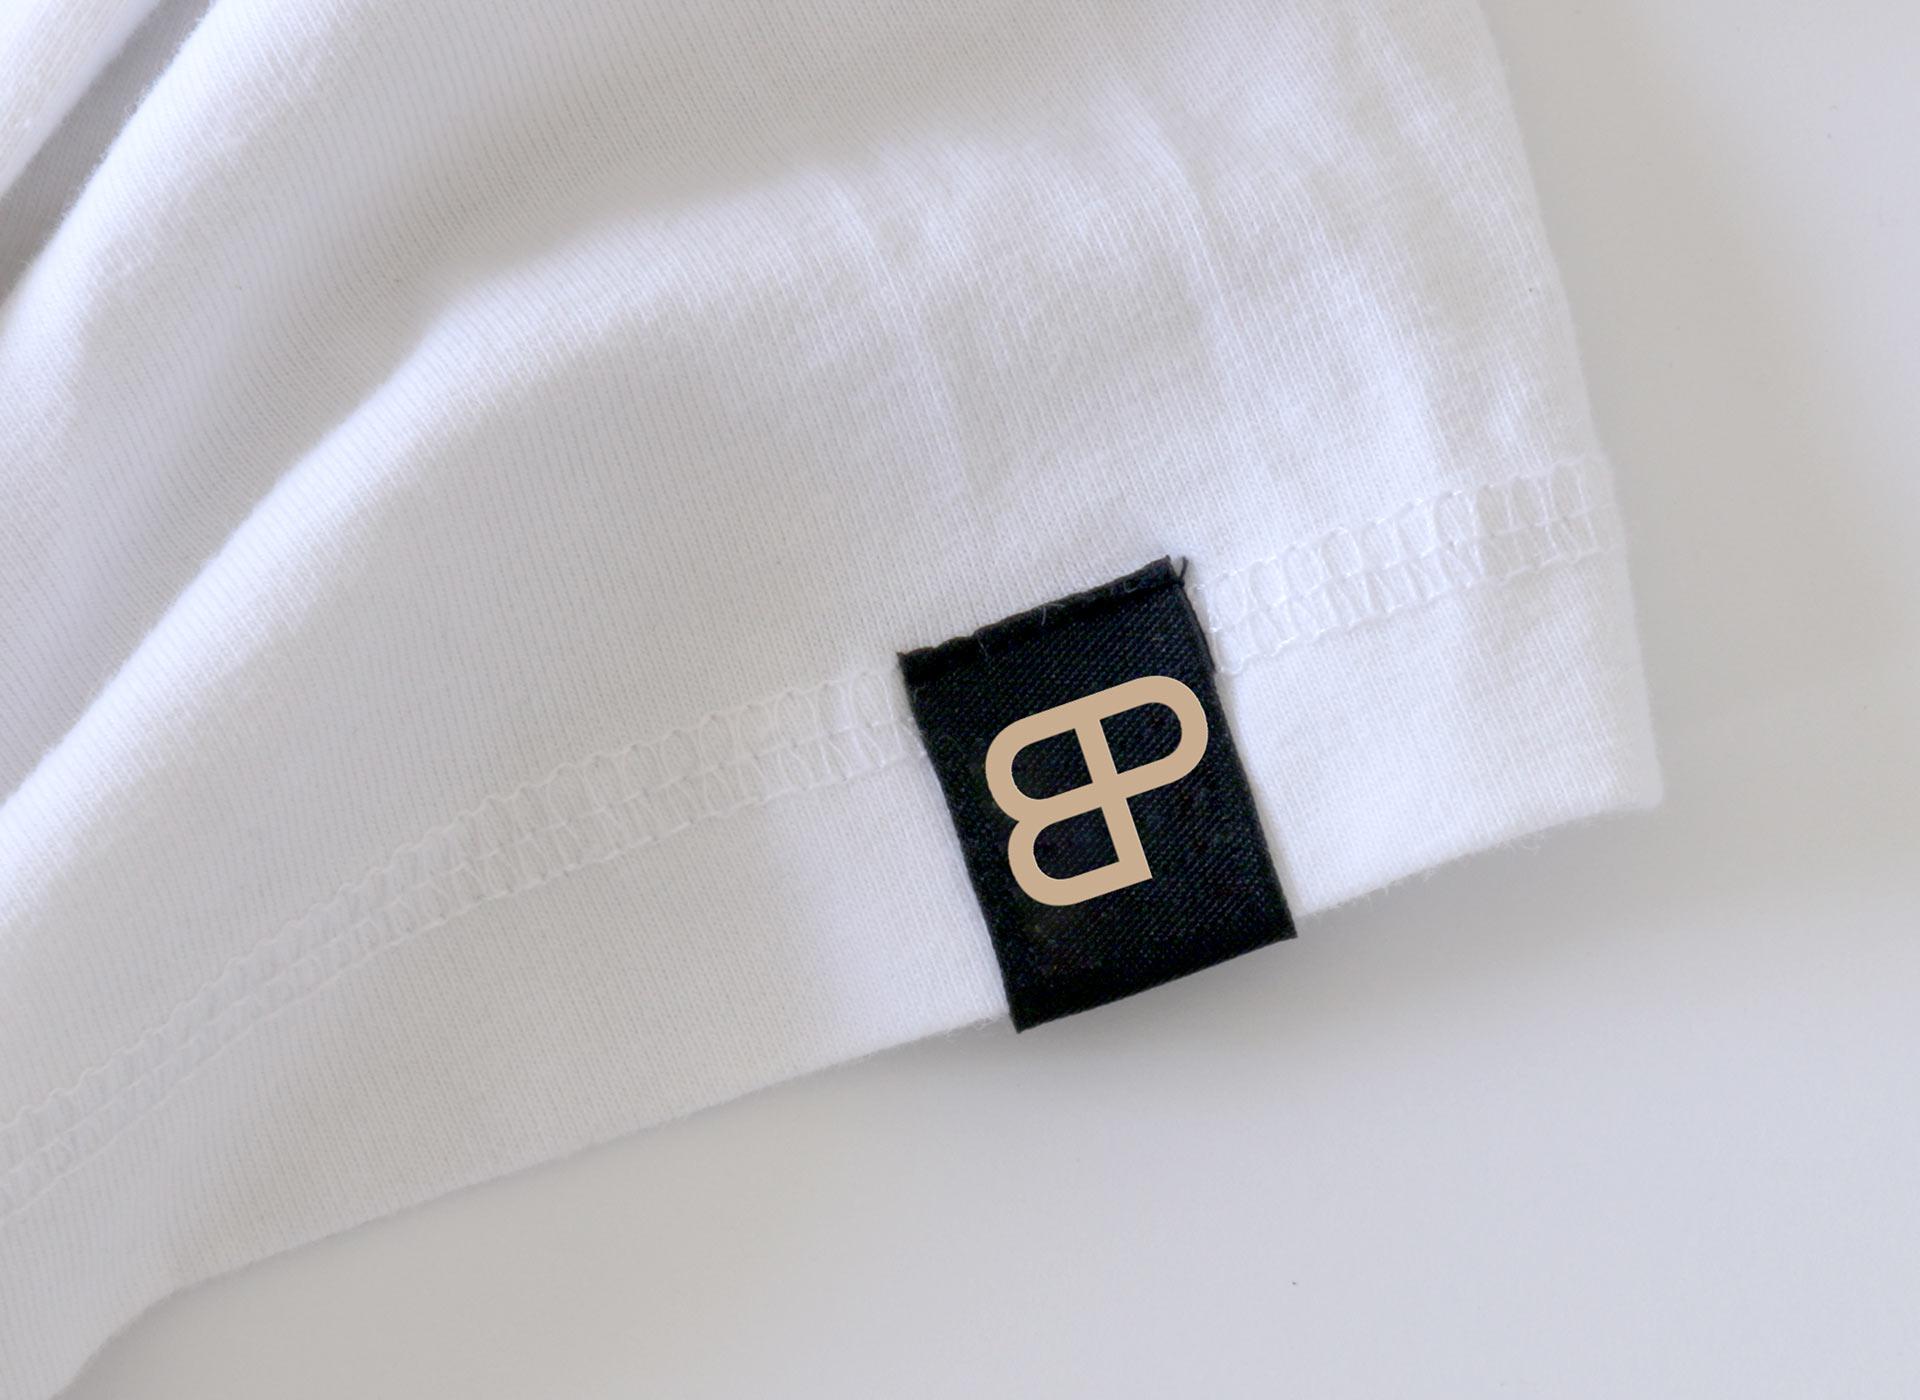 bel punto label